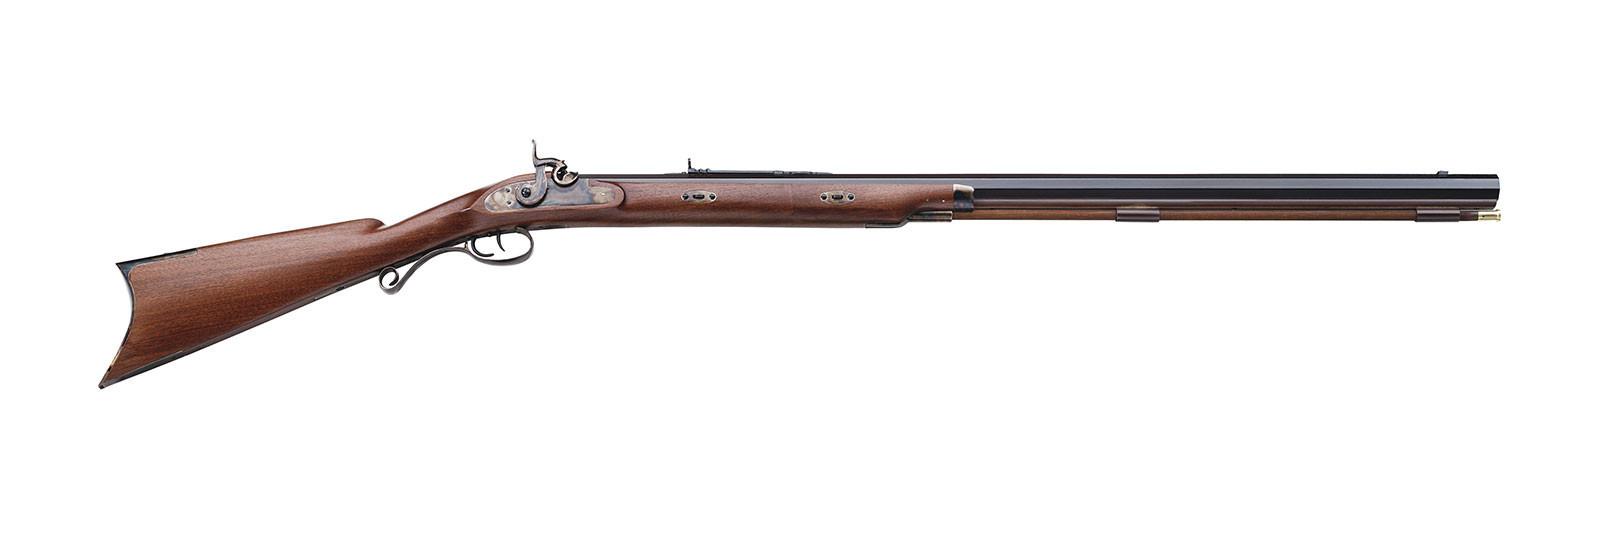 "Rocky Mountain Hawken ""walnut"" Rifle"